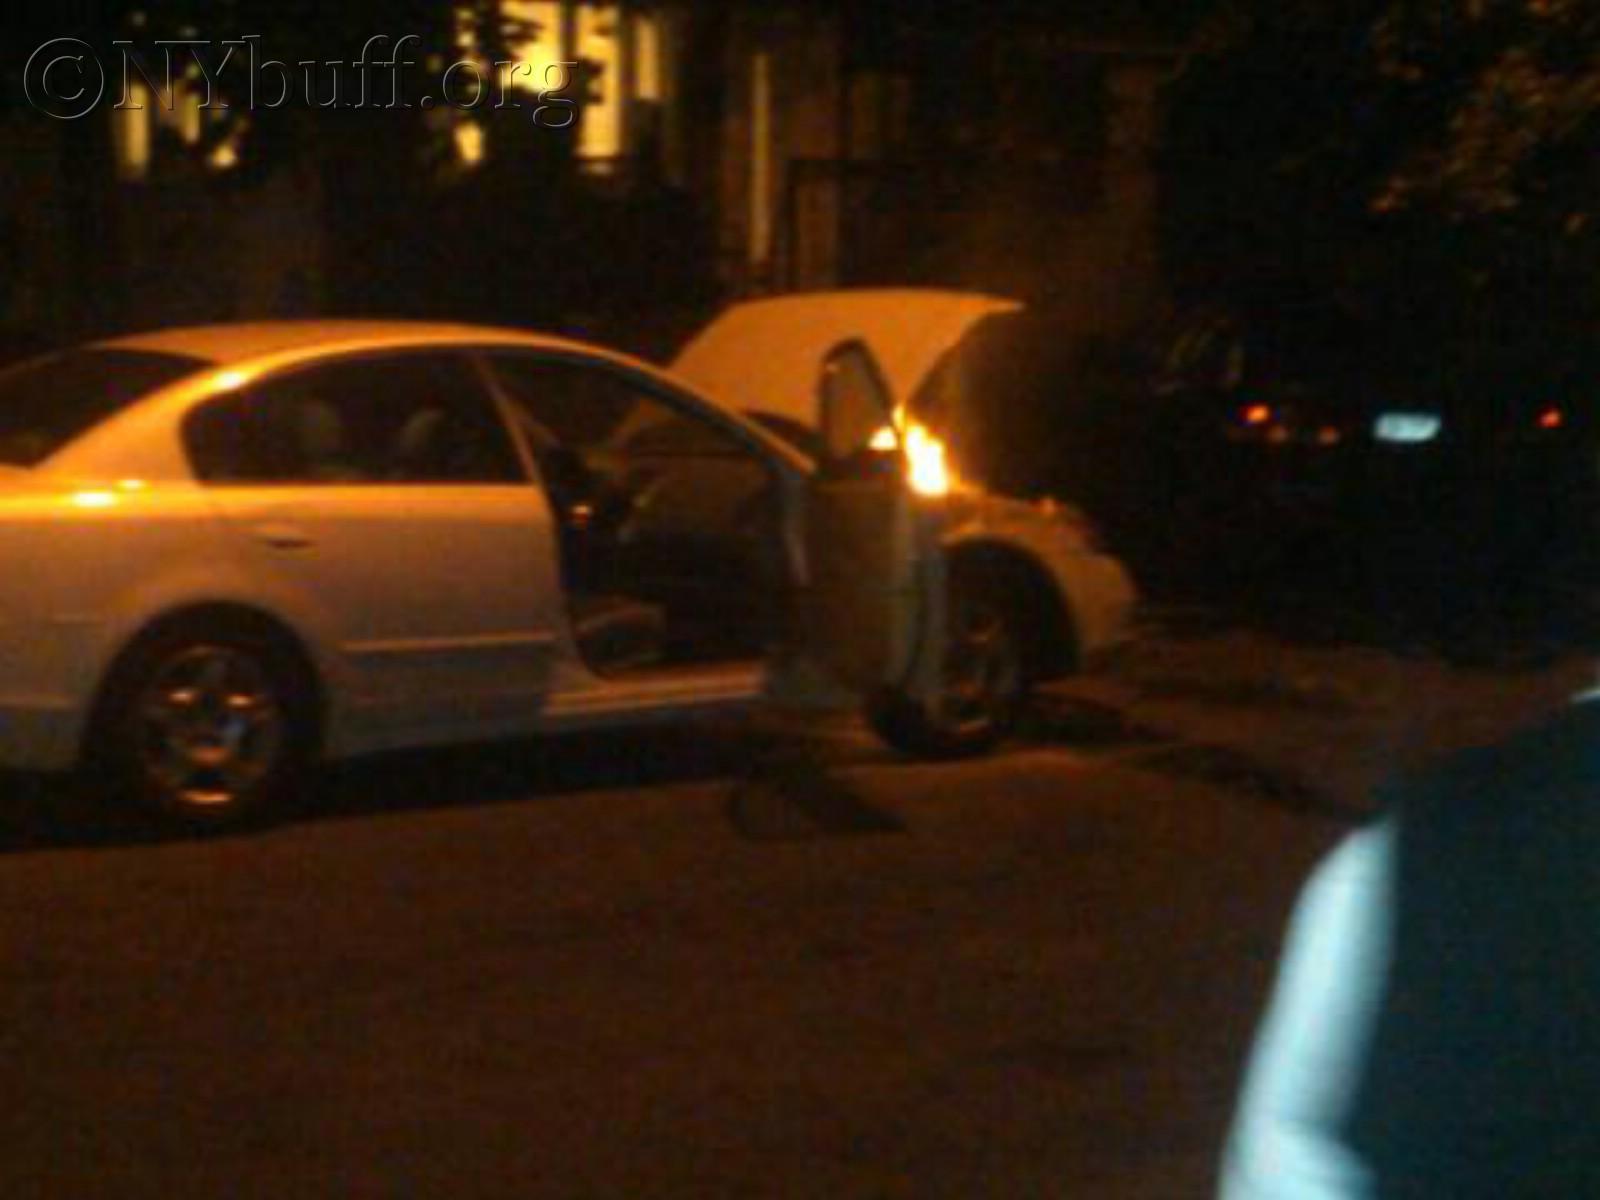 of a car fire last night,